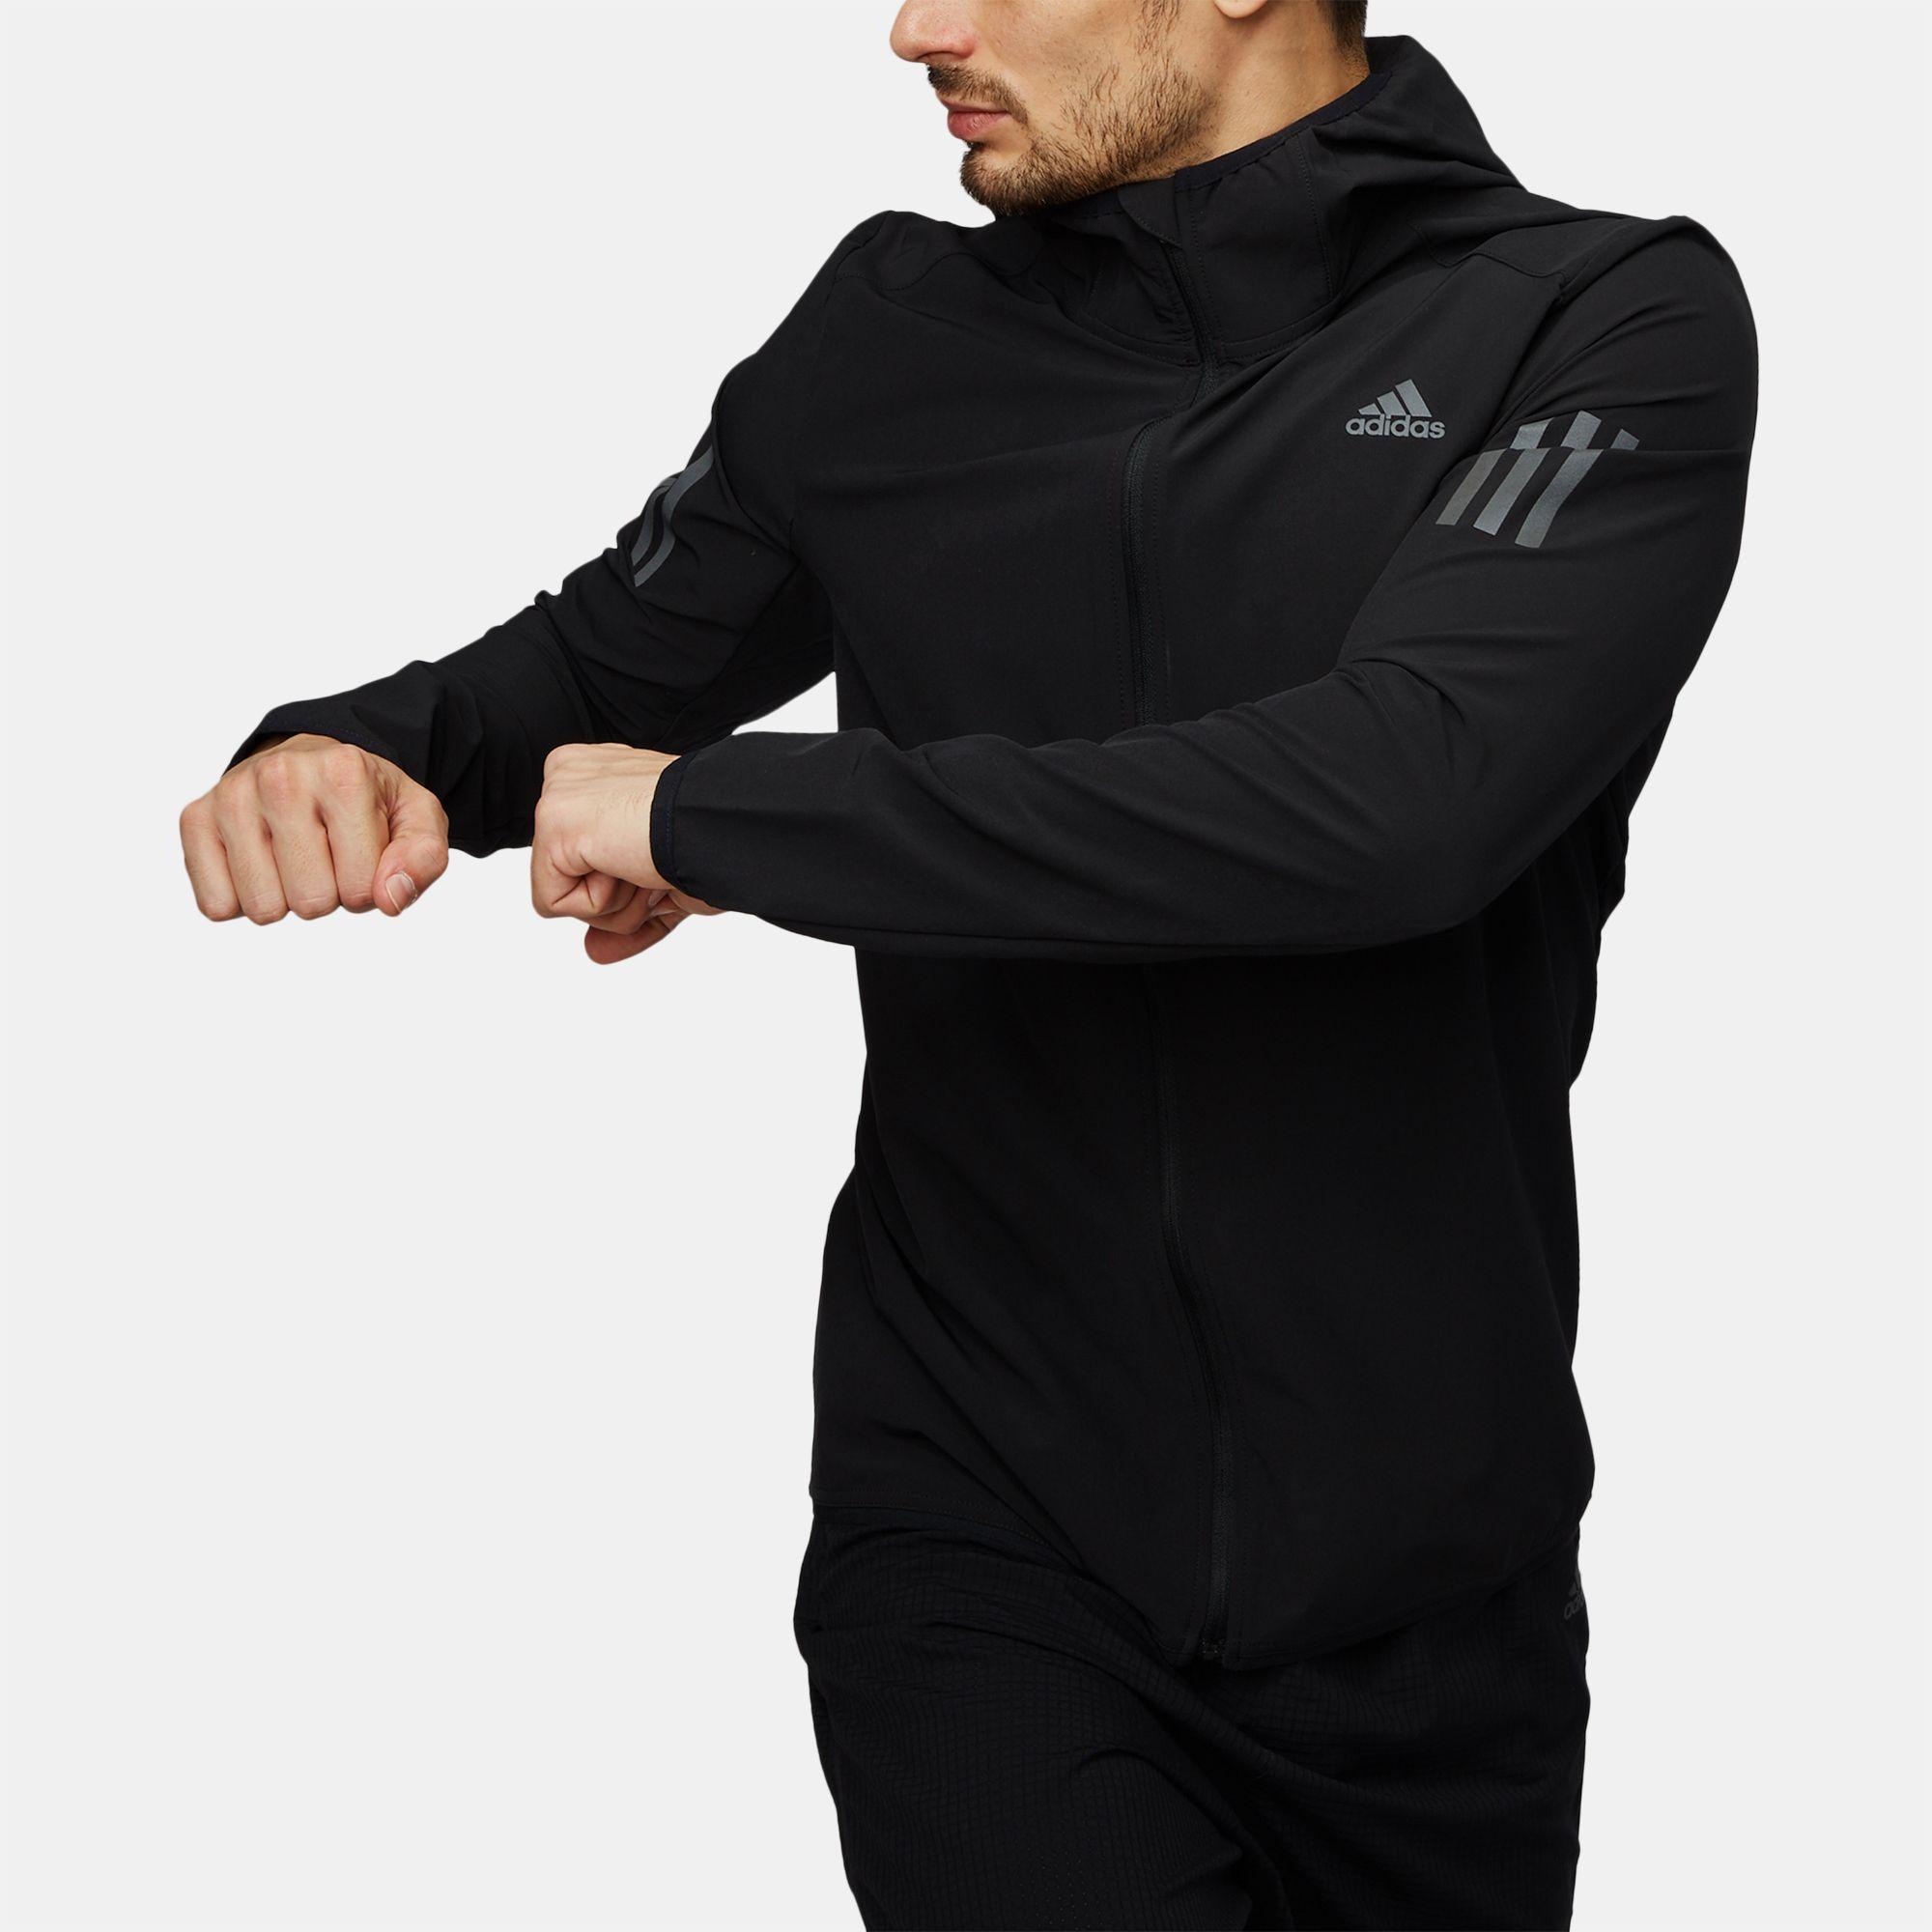 91b894bb9e87 adidas Response Shell Jacket